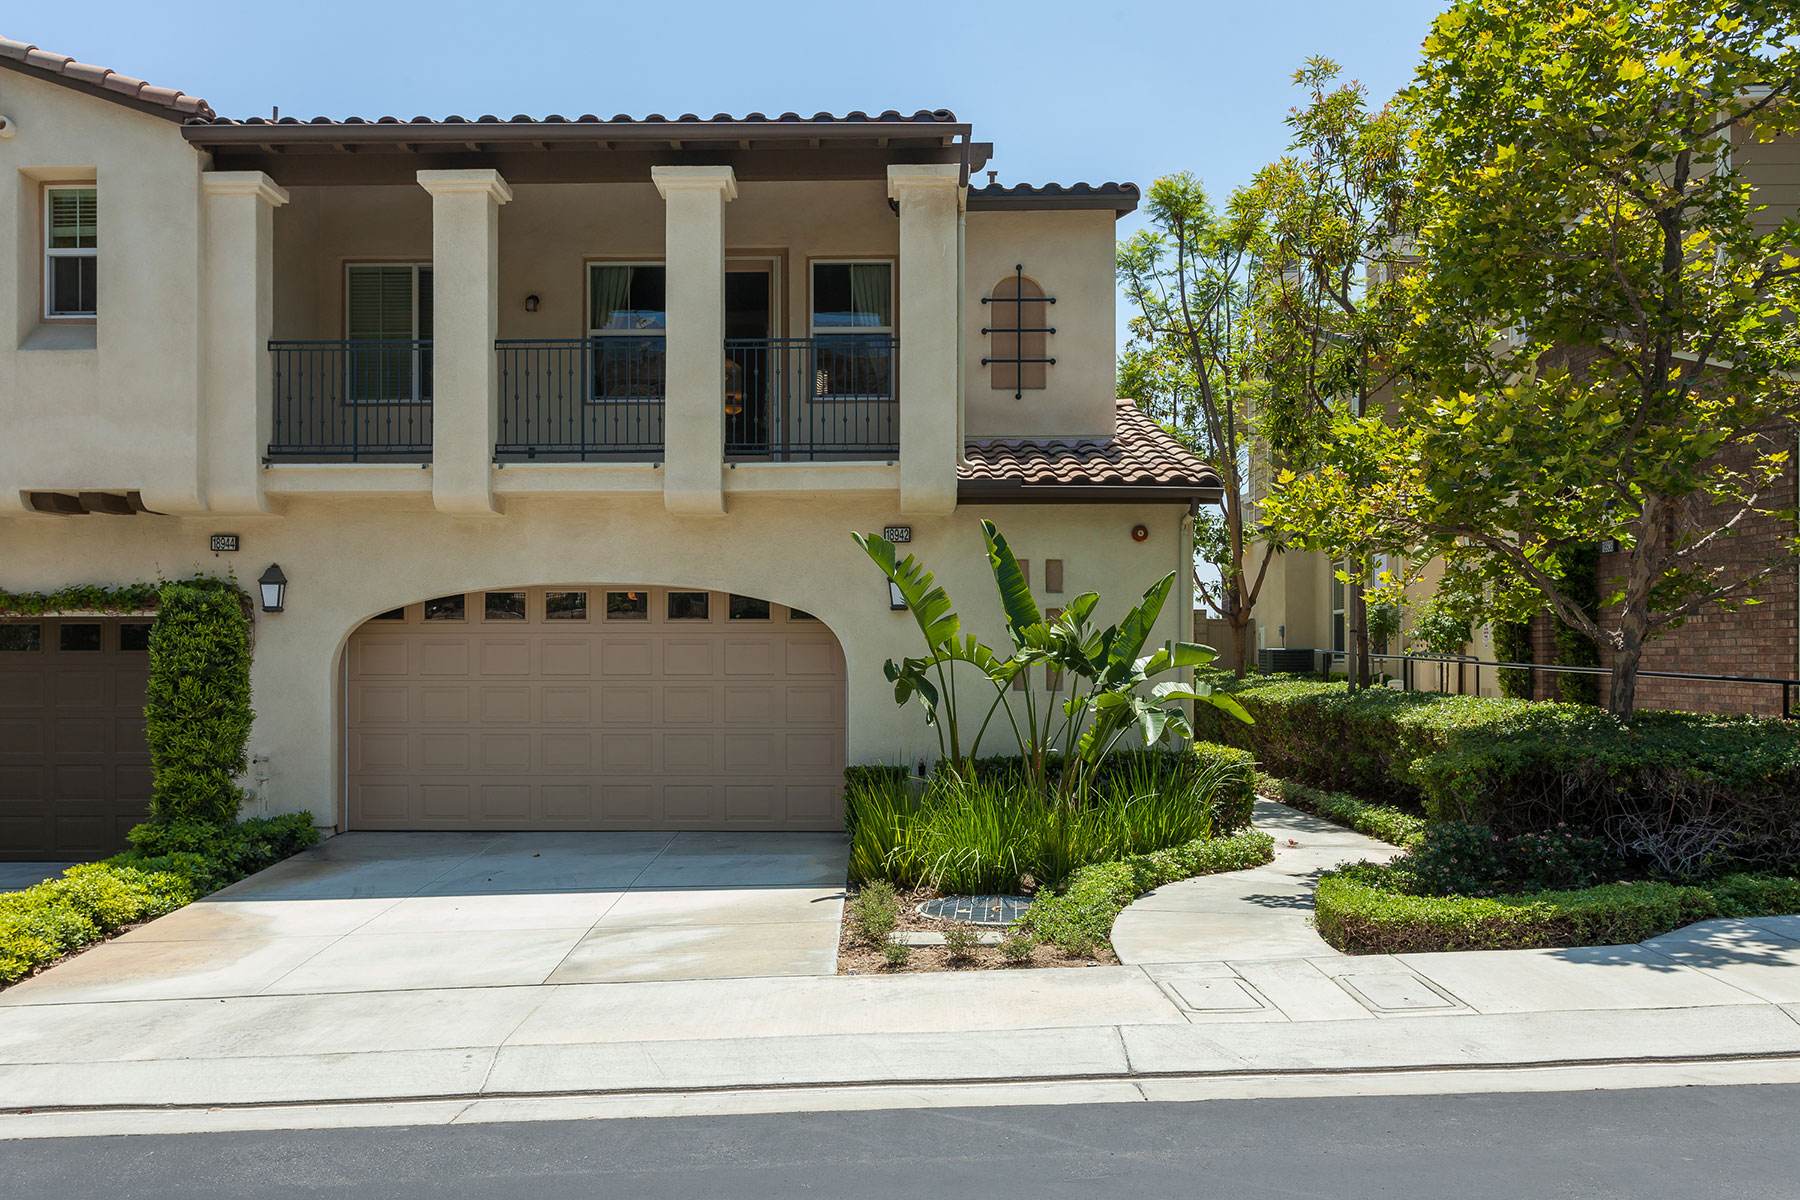 Single Family Home for Sale at 18942 Spectacular Bid Yorba Linda, California, 92886 United States